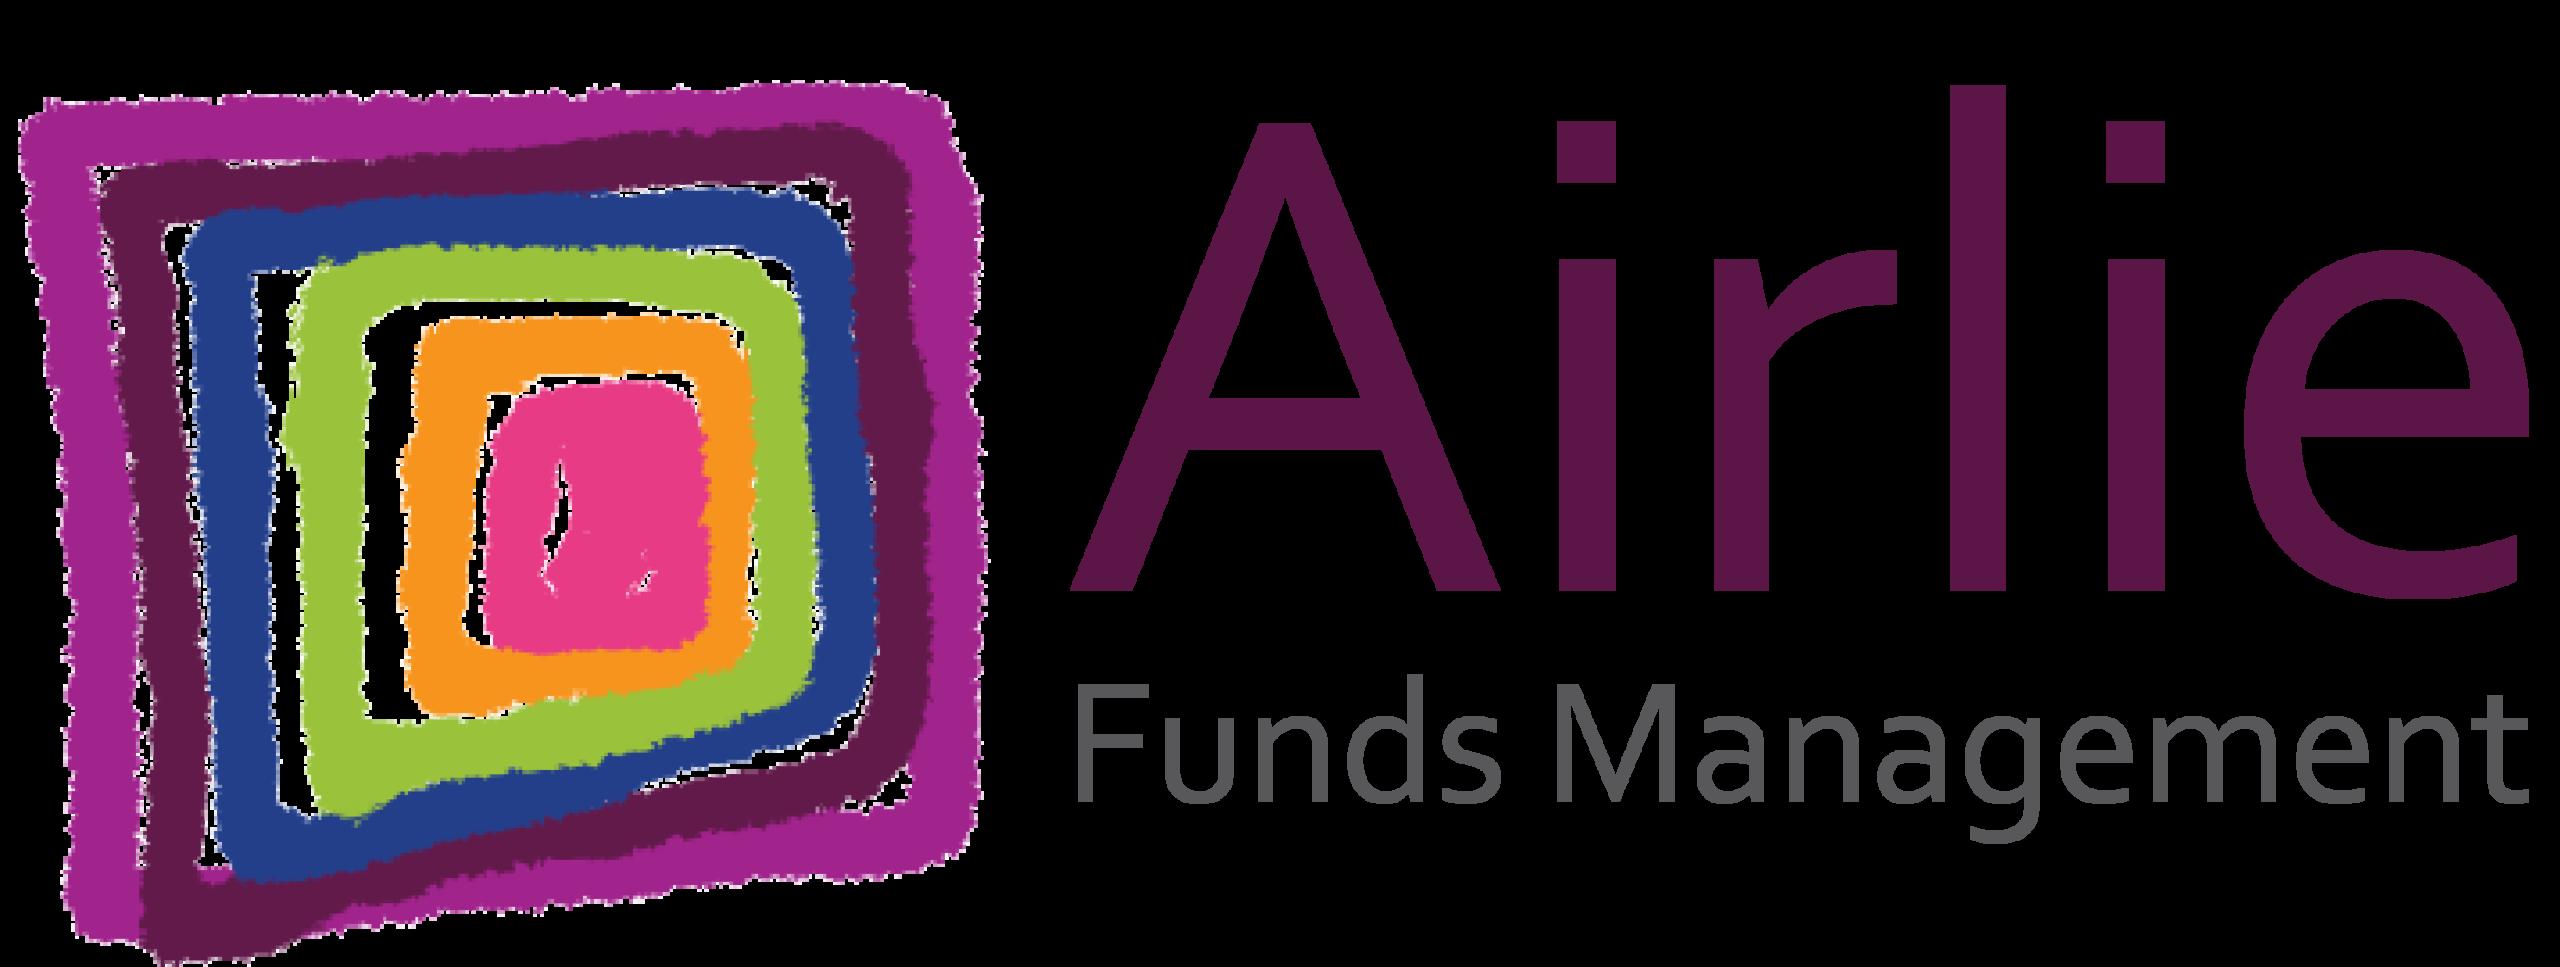 Airlie Funds Management